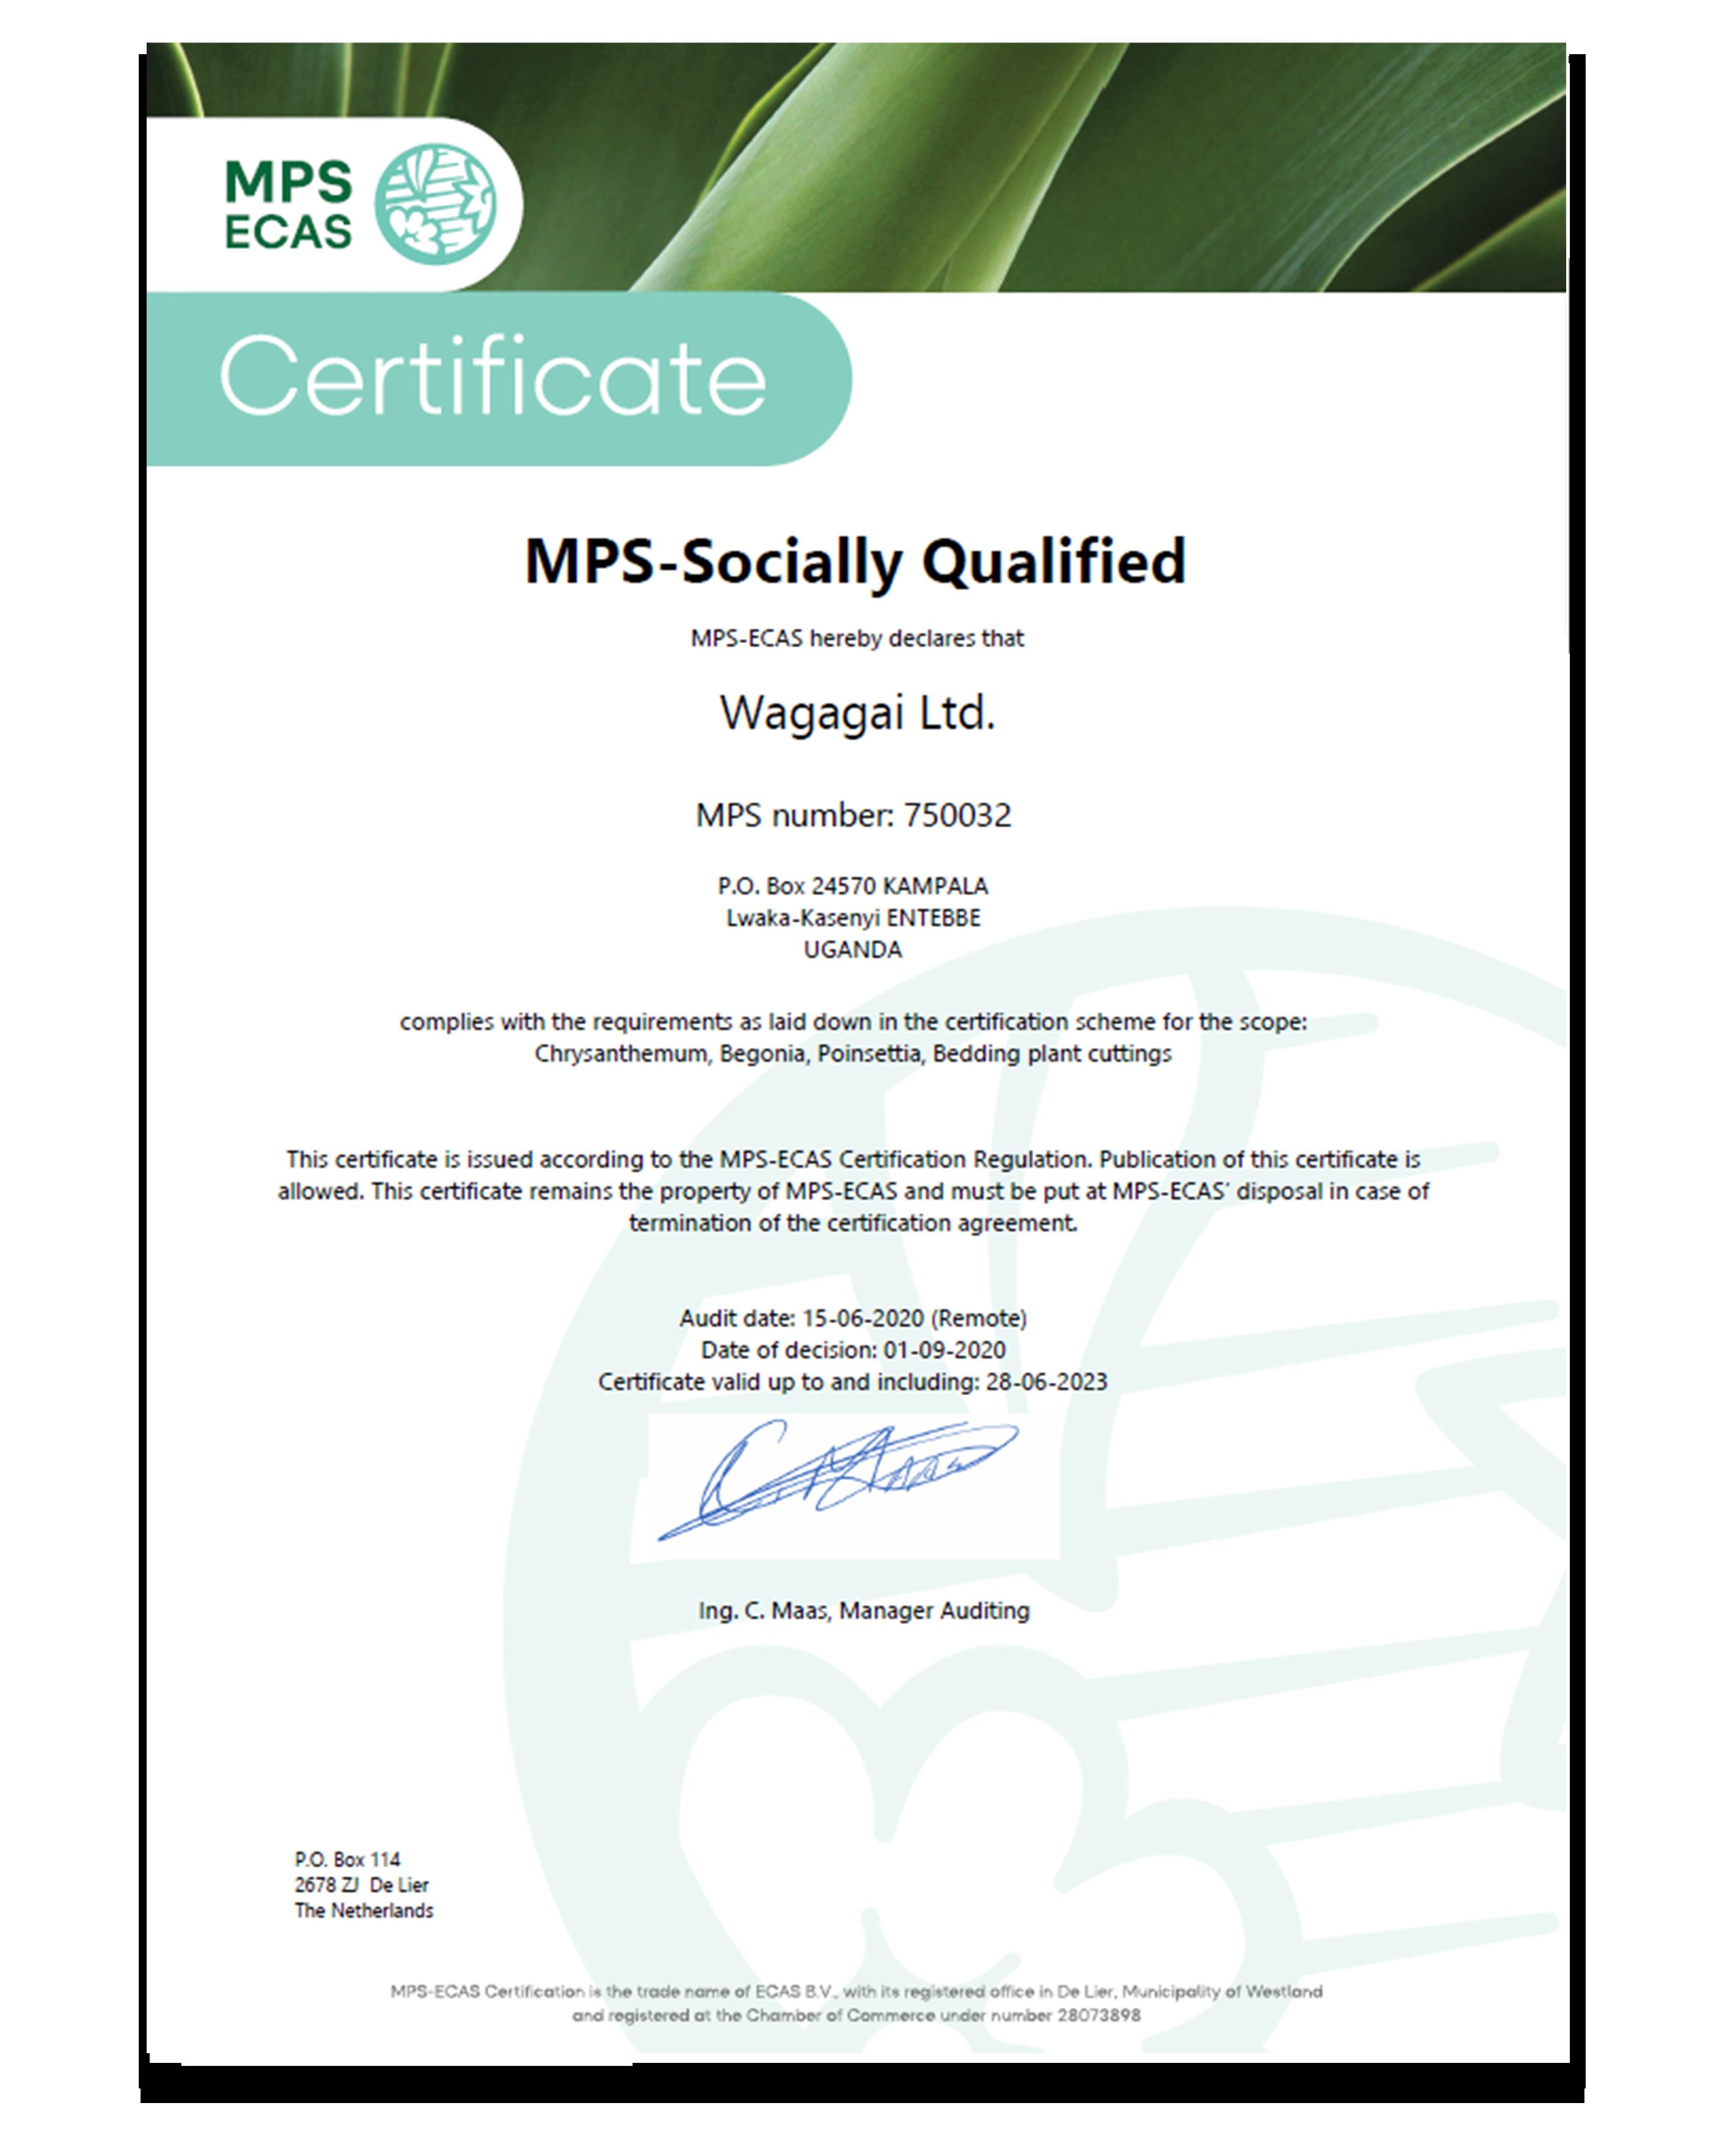 MPS-SQ Wagagai